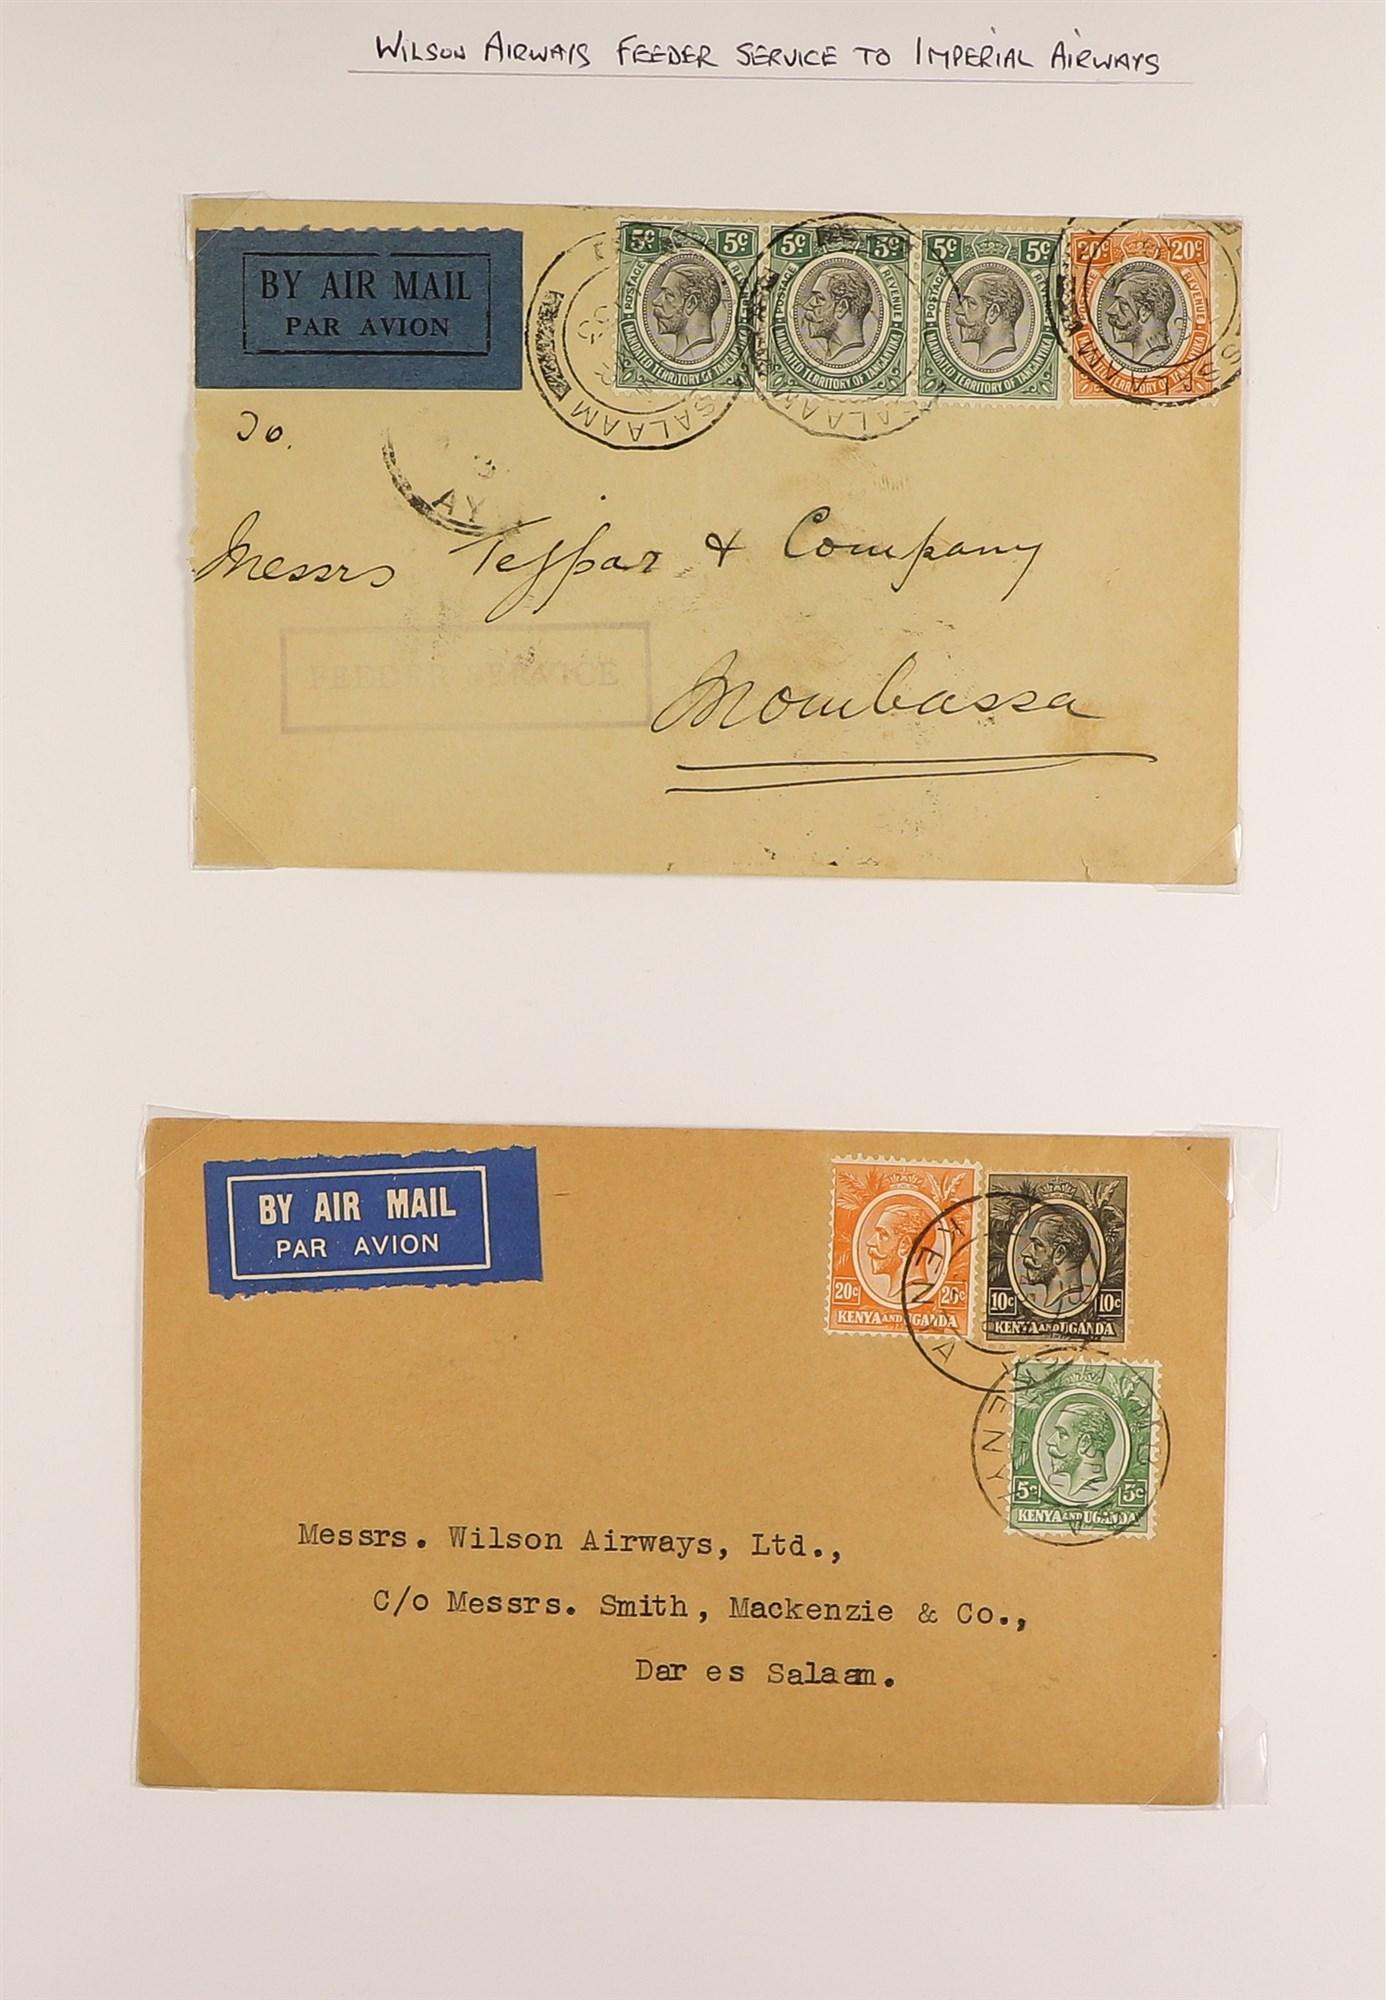 K.U.T. 1927-36 AIRMAIL COVERS COLLECTION incl. 1927 Kenya-Sudan, 1931 Christmas Flight, 1931 - Image 2 of 4